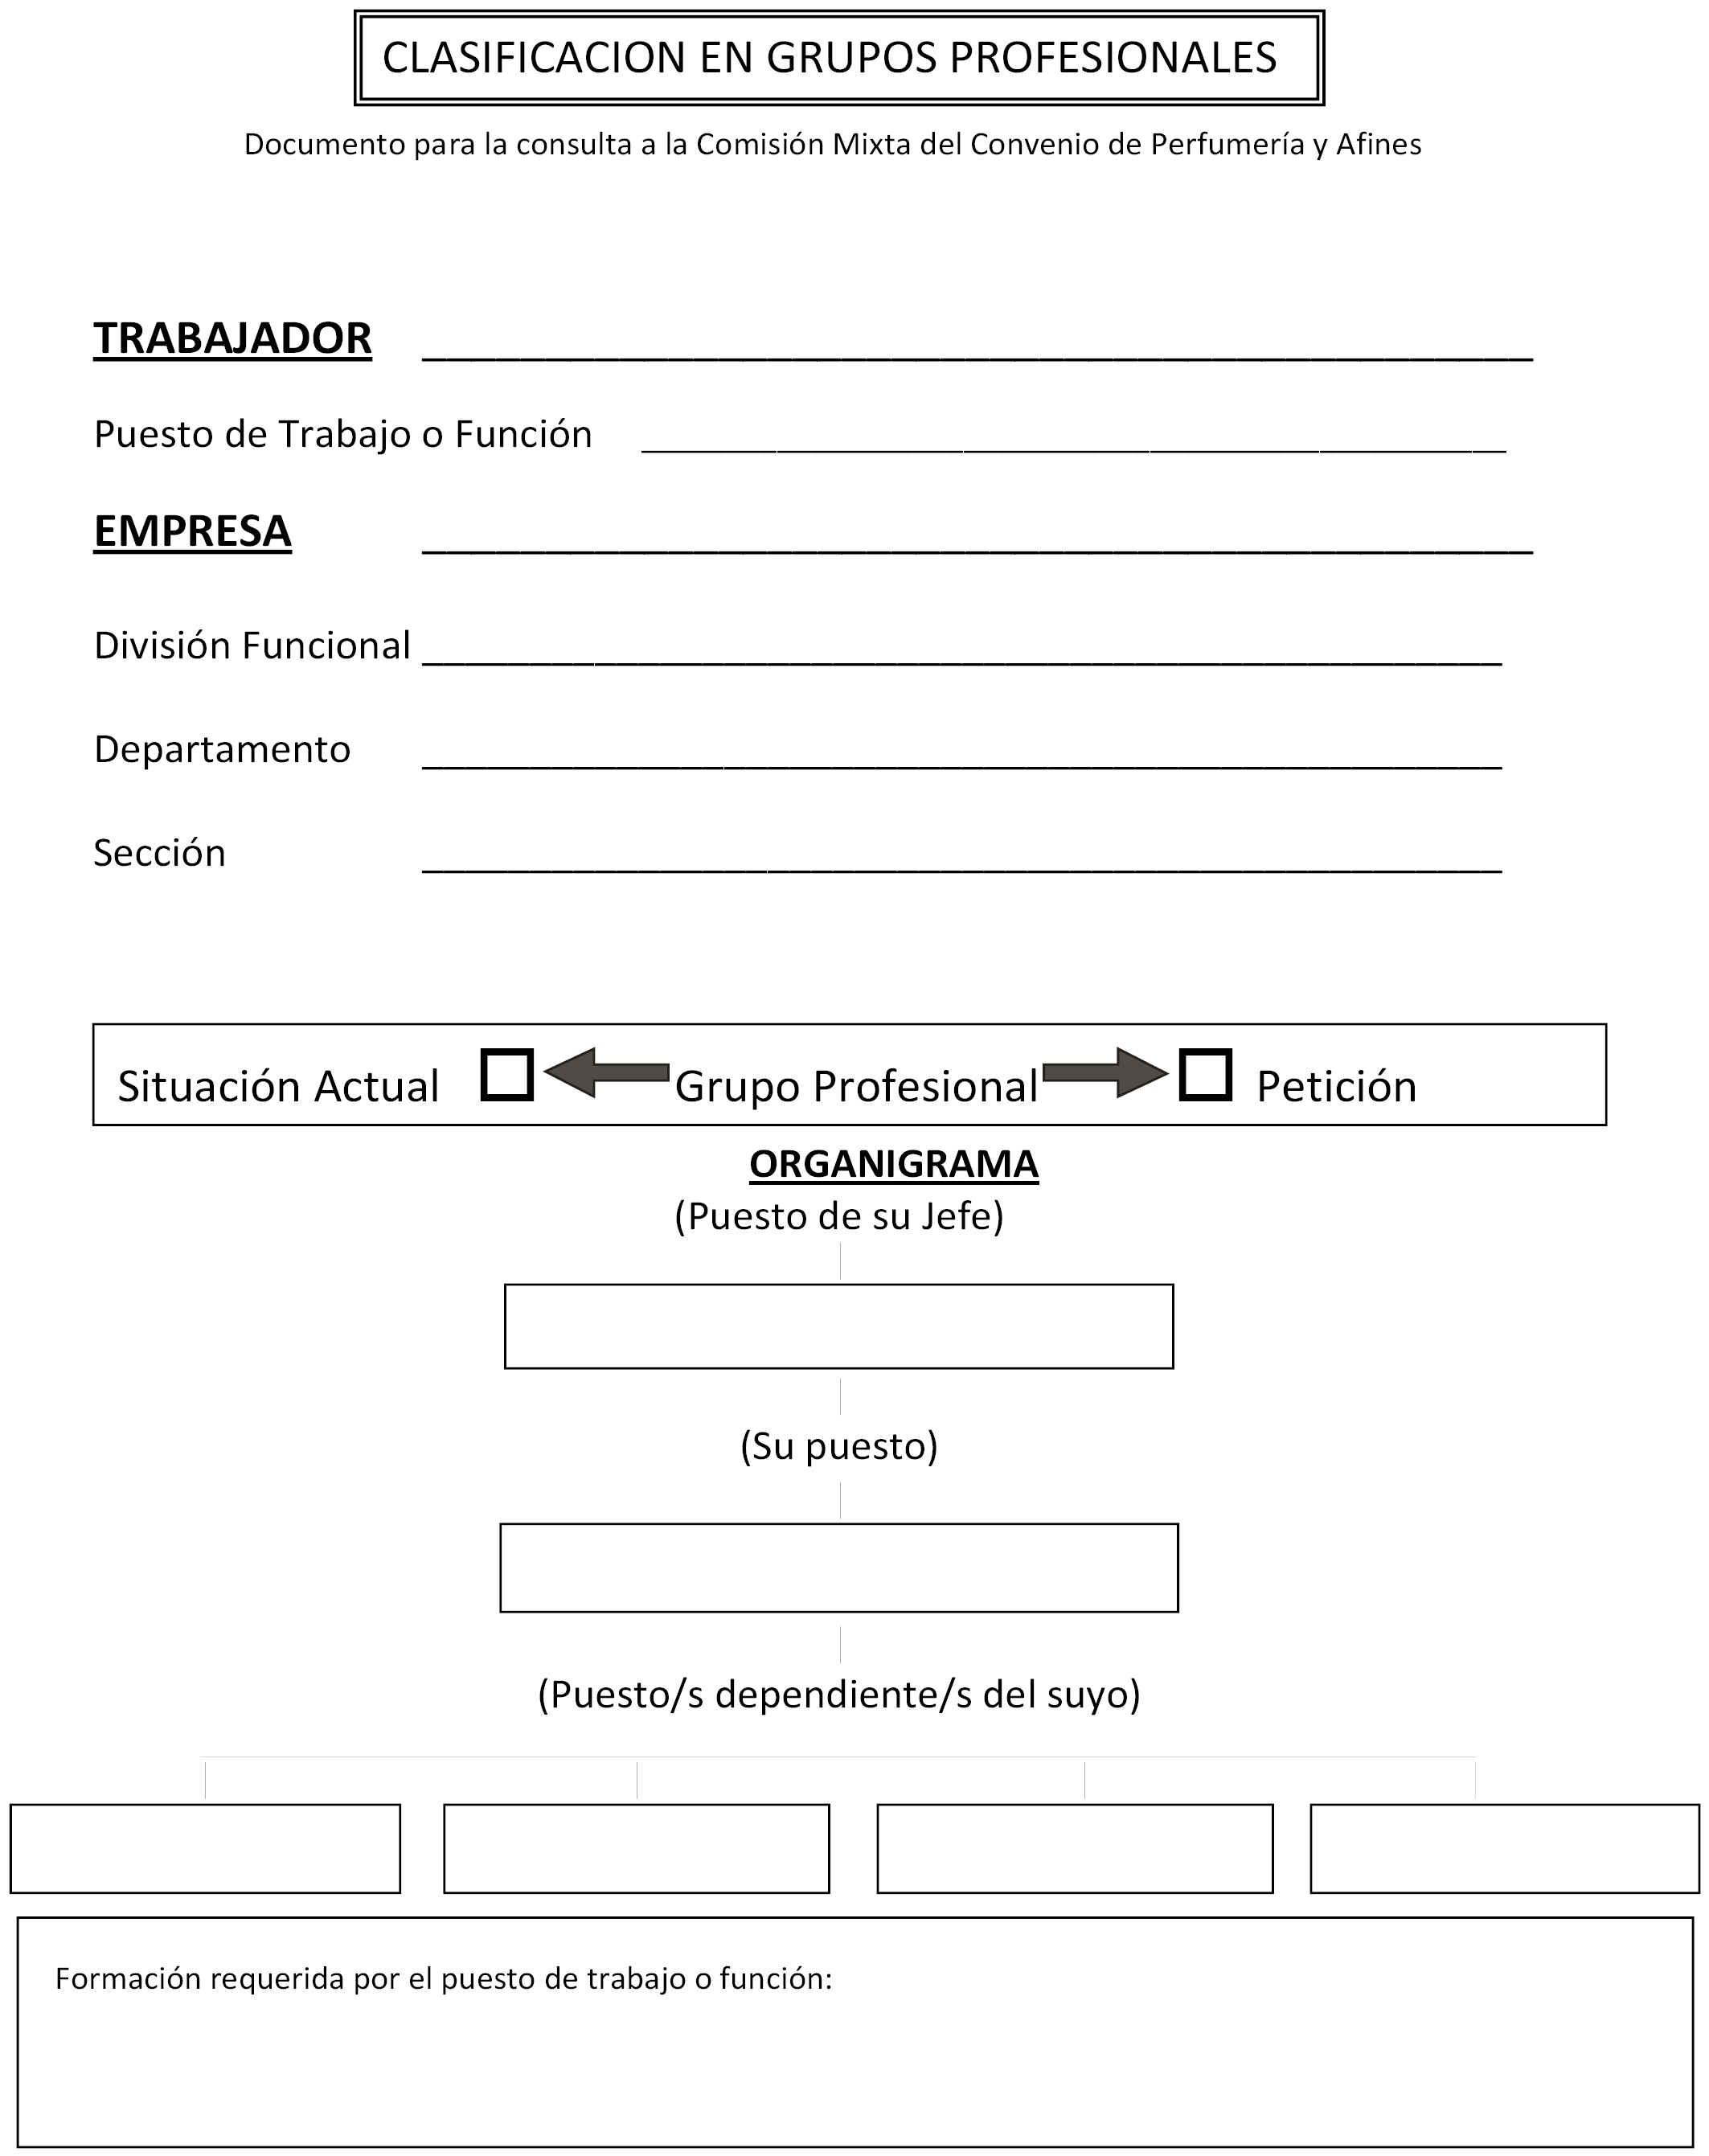 BOE.es - Documento BOE-A-2012-12566